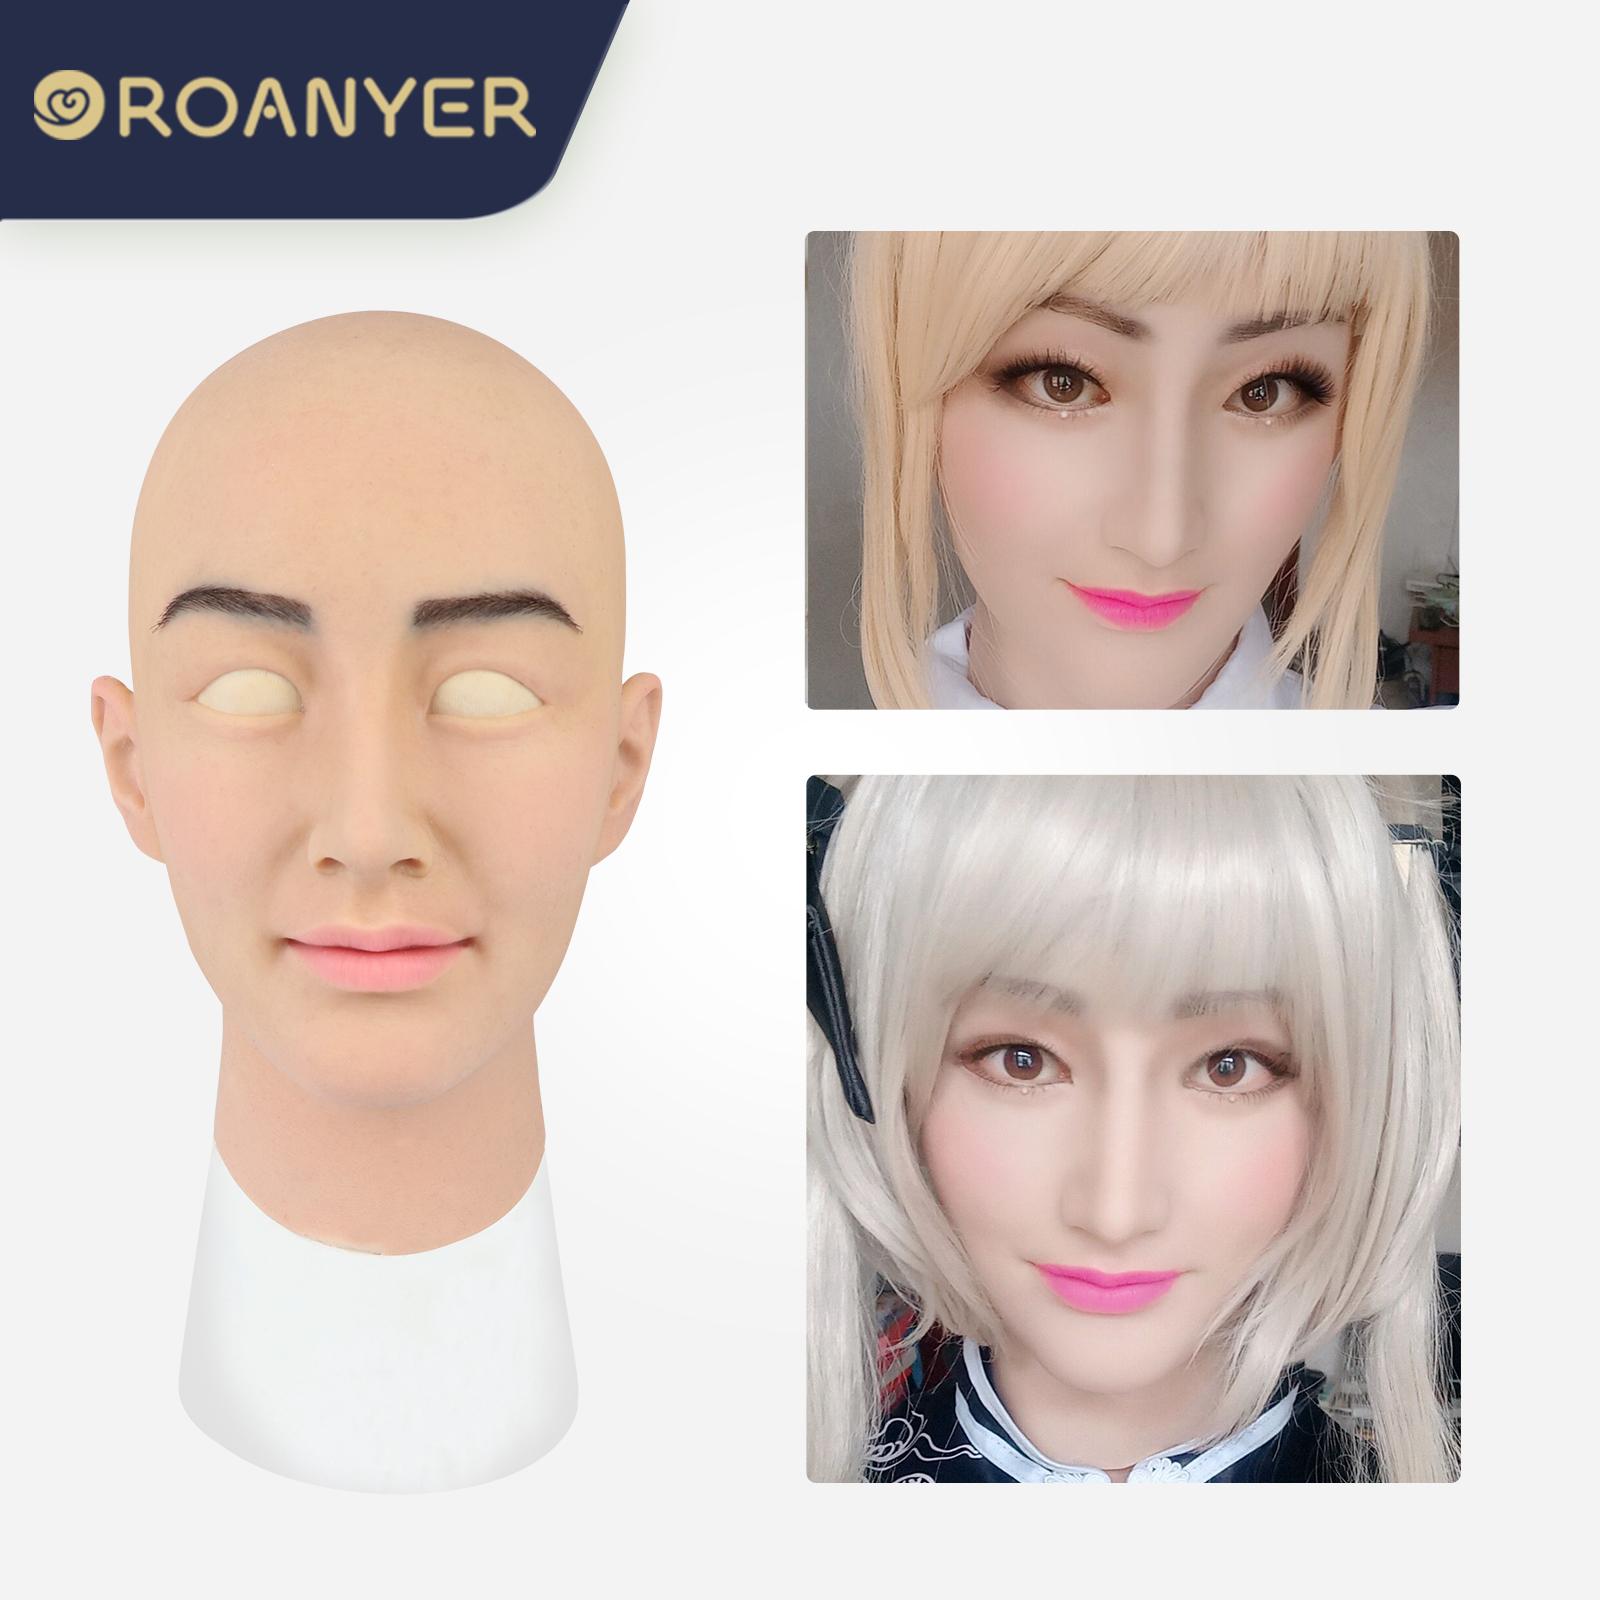 ROANYER 男の娘 仮面  男性用 メイク マスク美人陽ちゃん